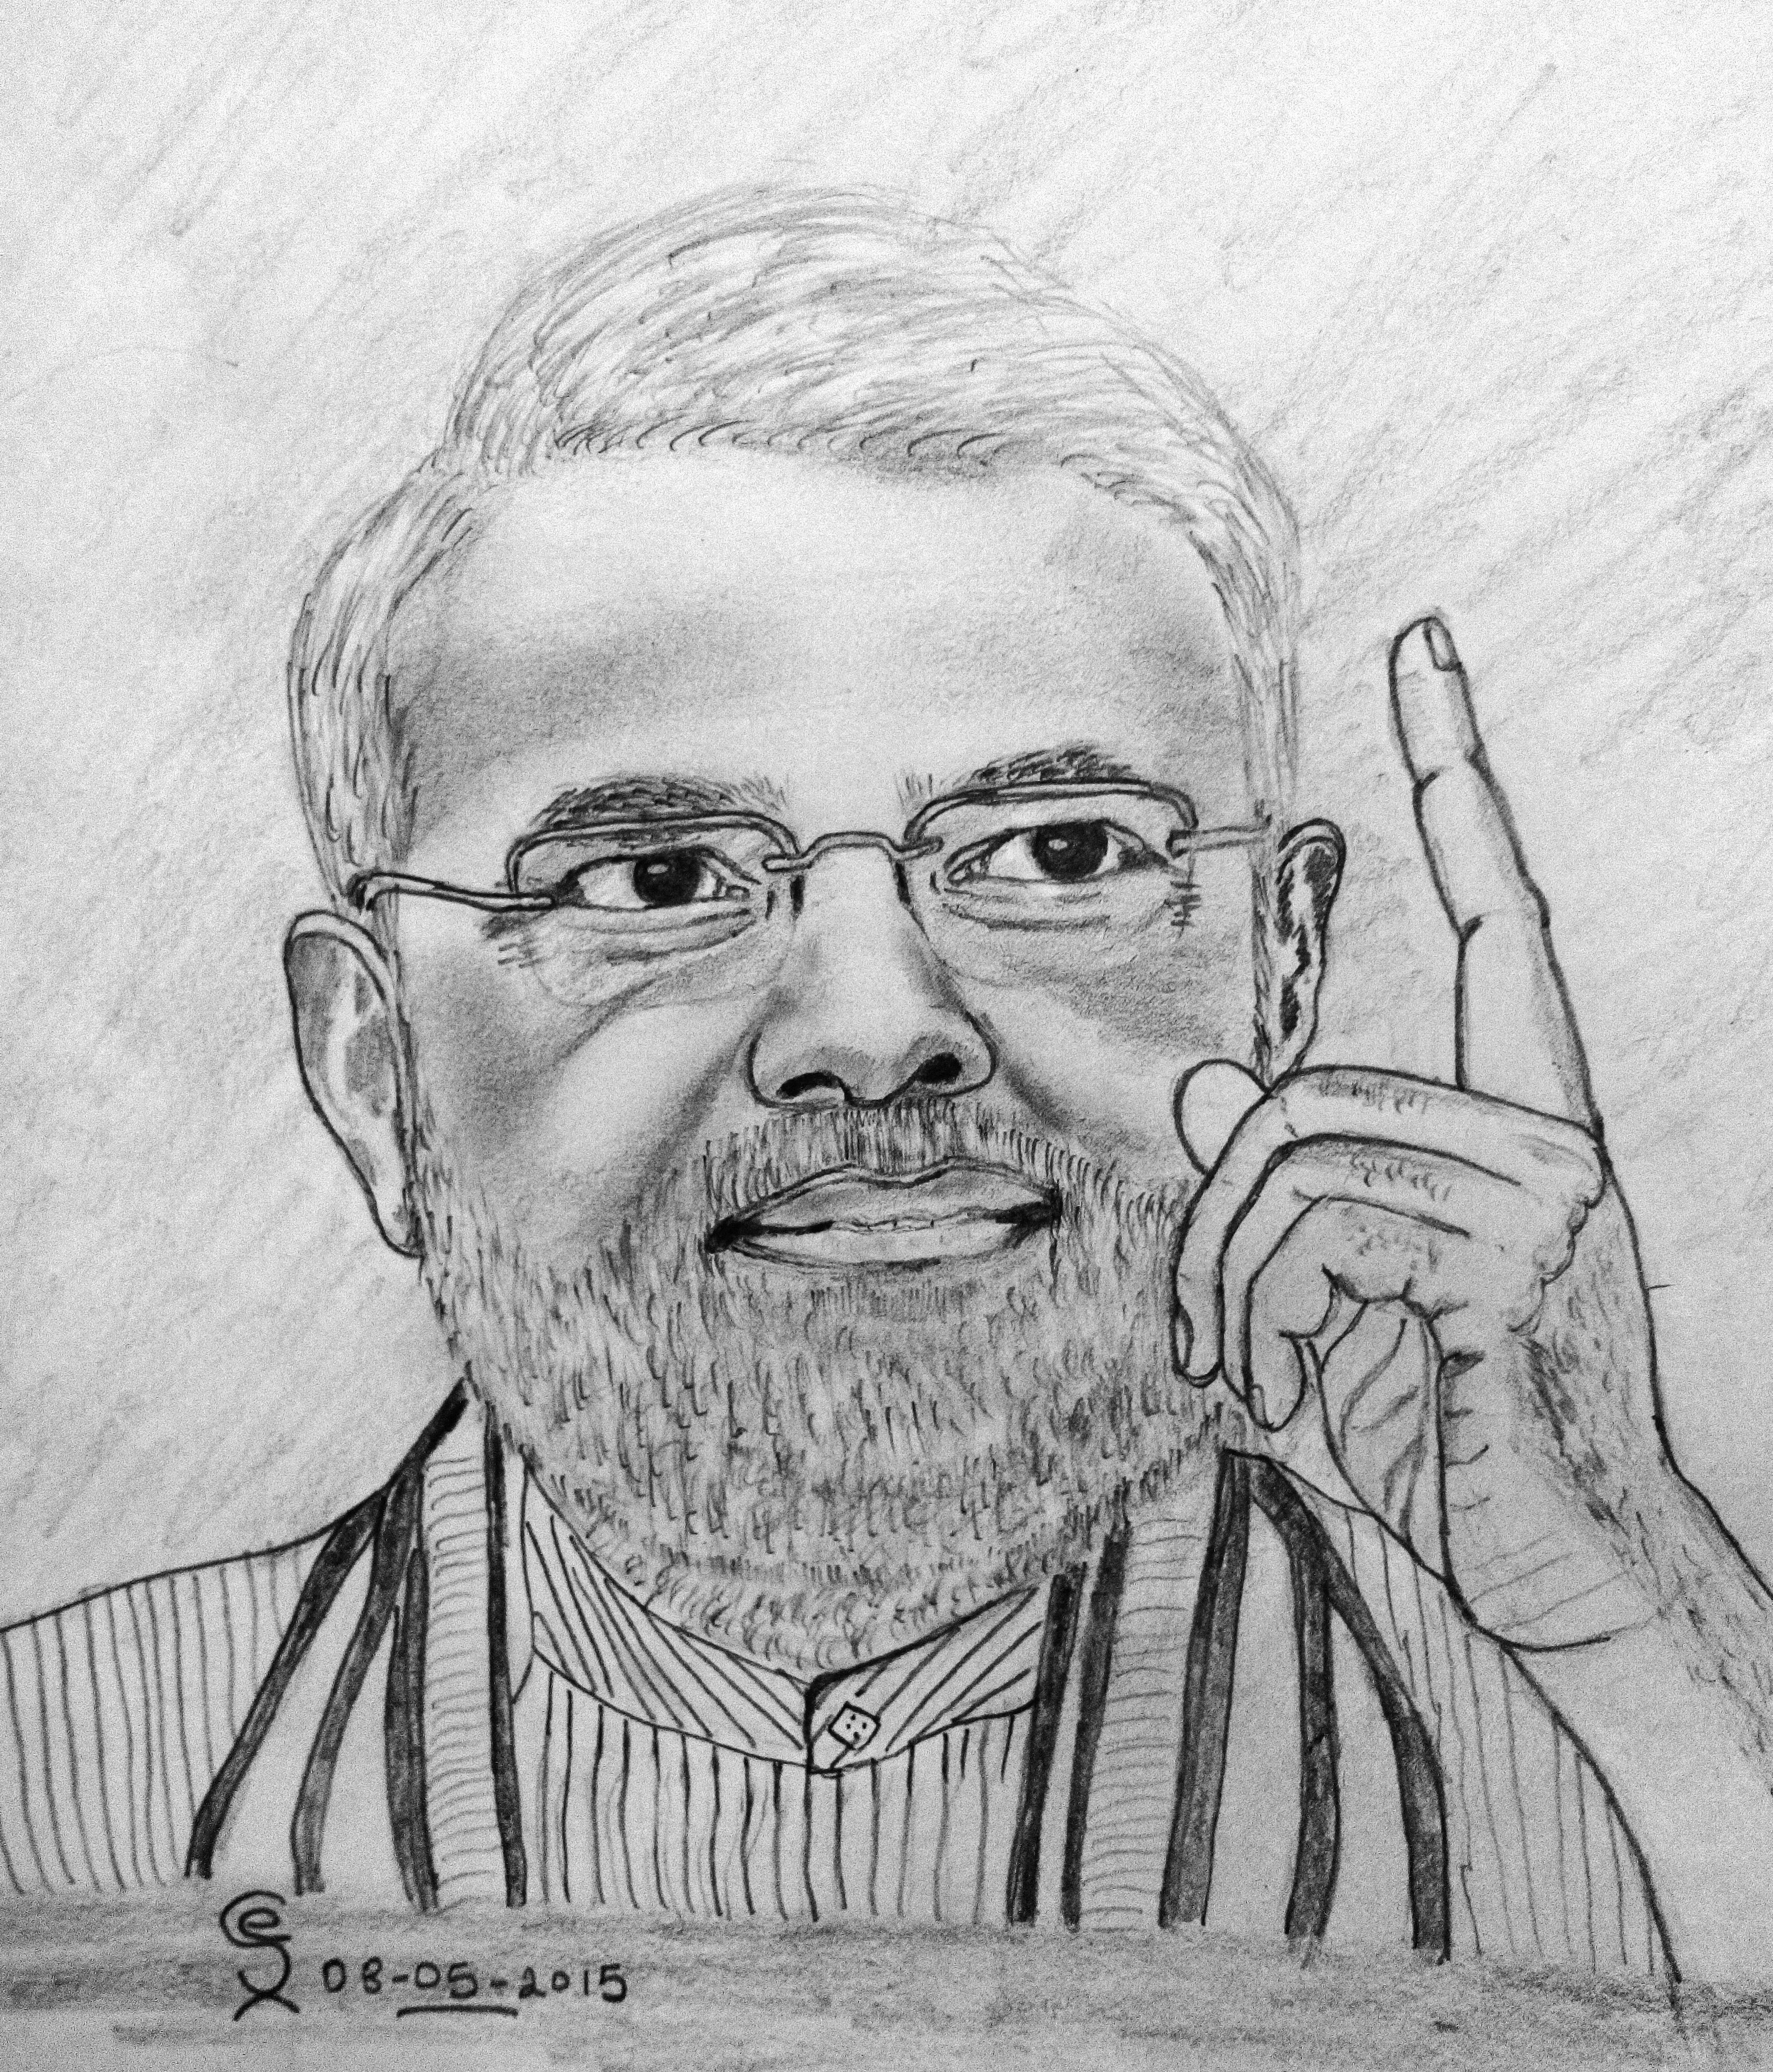 Prime minister of india mr narendra modi pencil drawing pencil